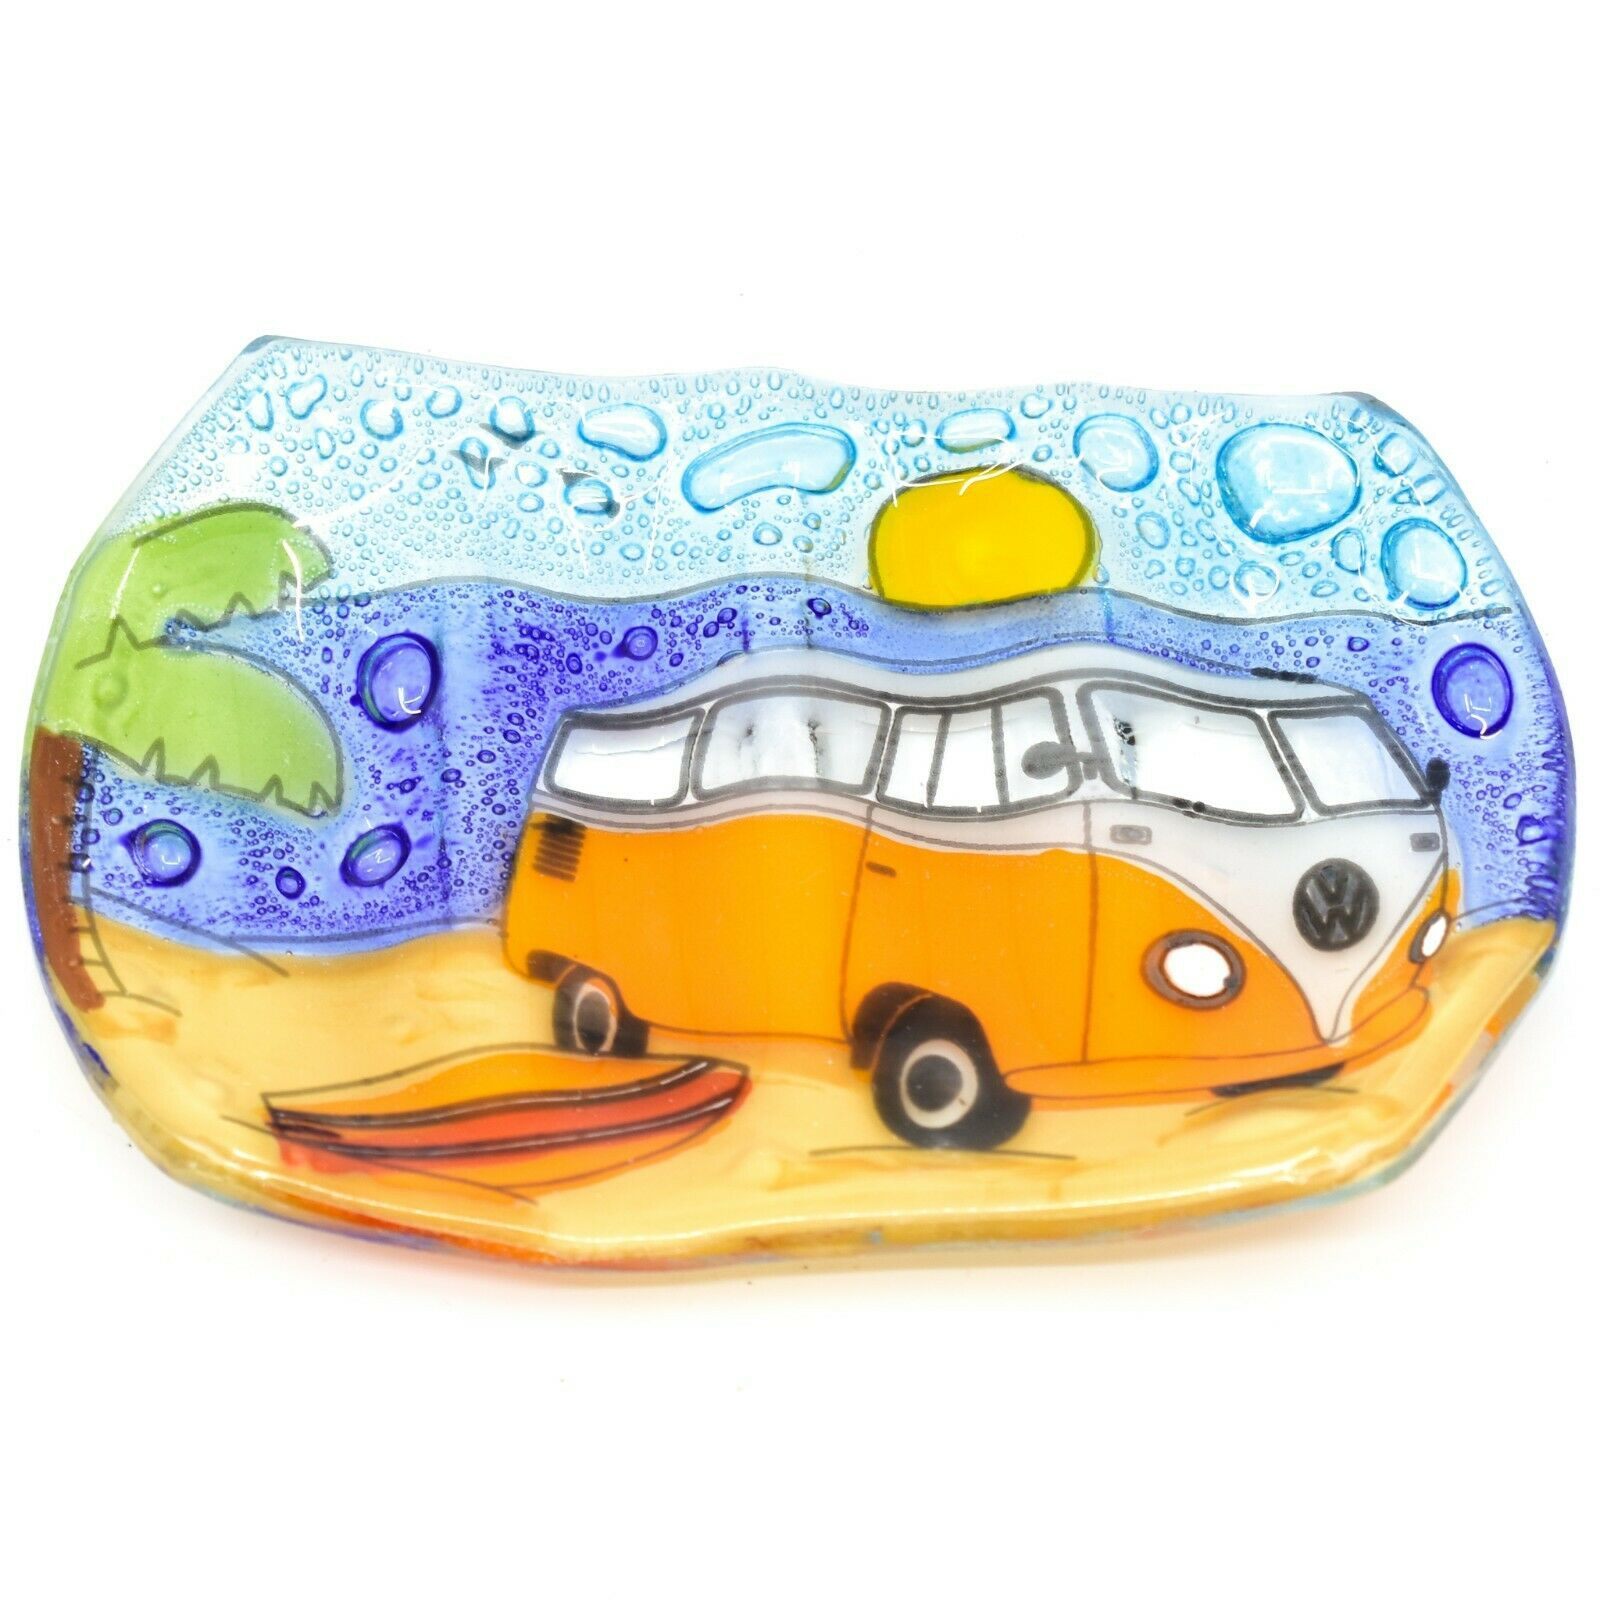 Fused Art Glass Volkswagen Van Surf Beach Design Soap Dish Handmade Ecuador